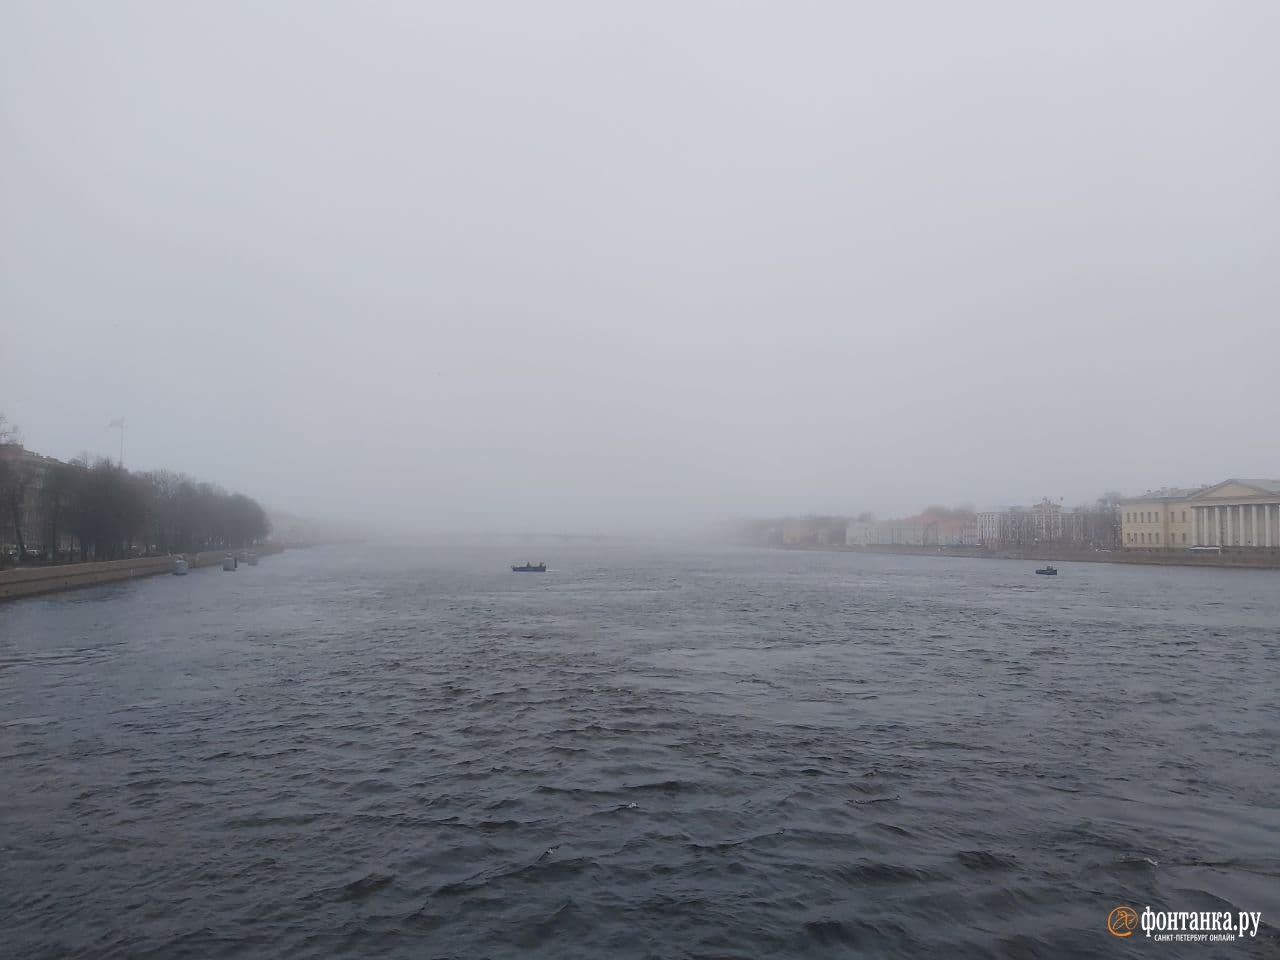 автор фото Николай Кудин / «Фонтанка.ру»